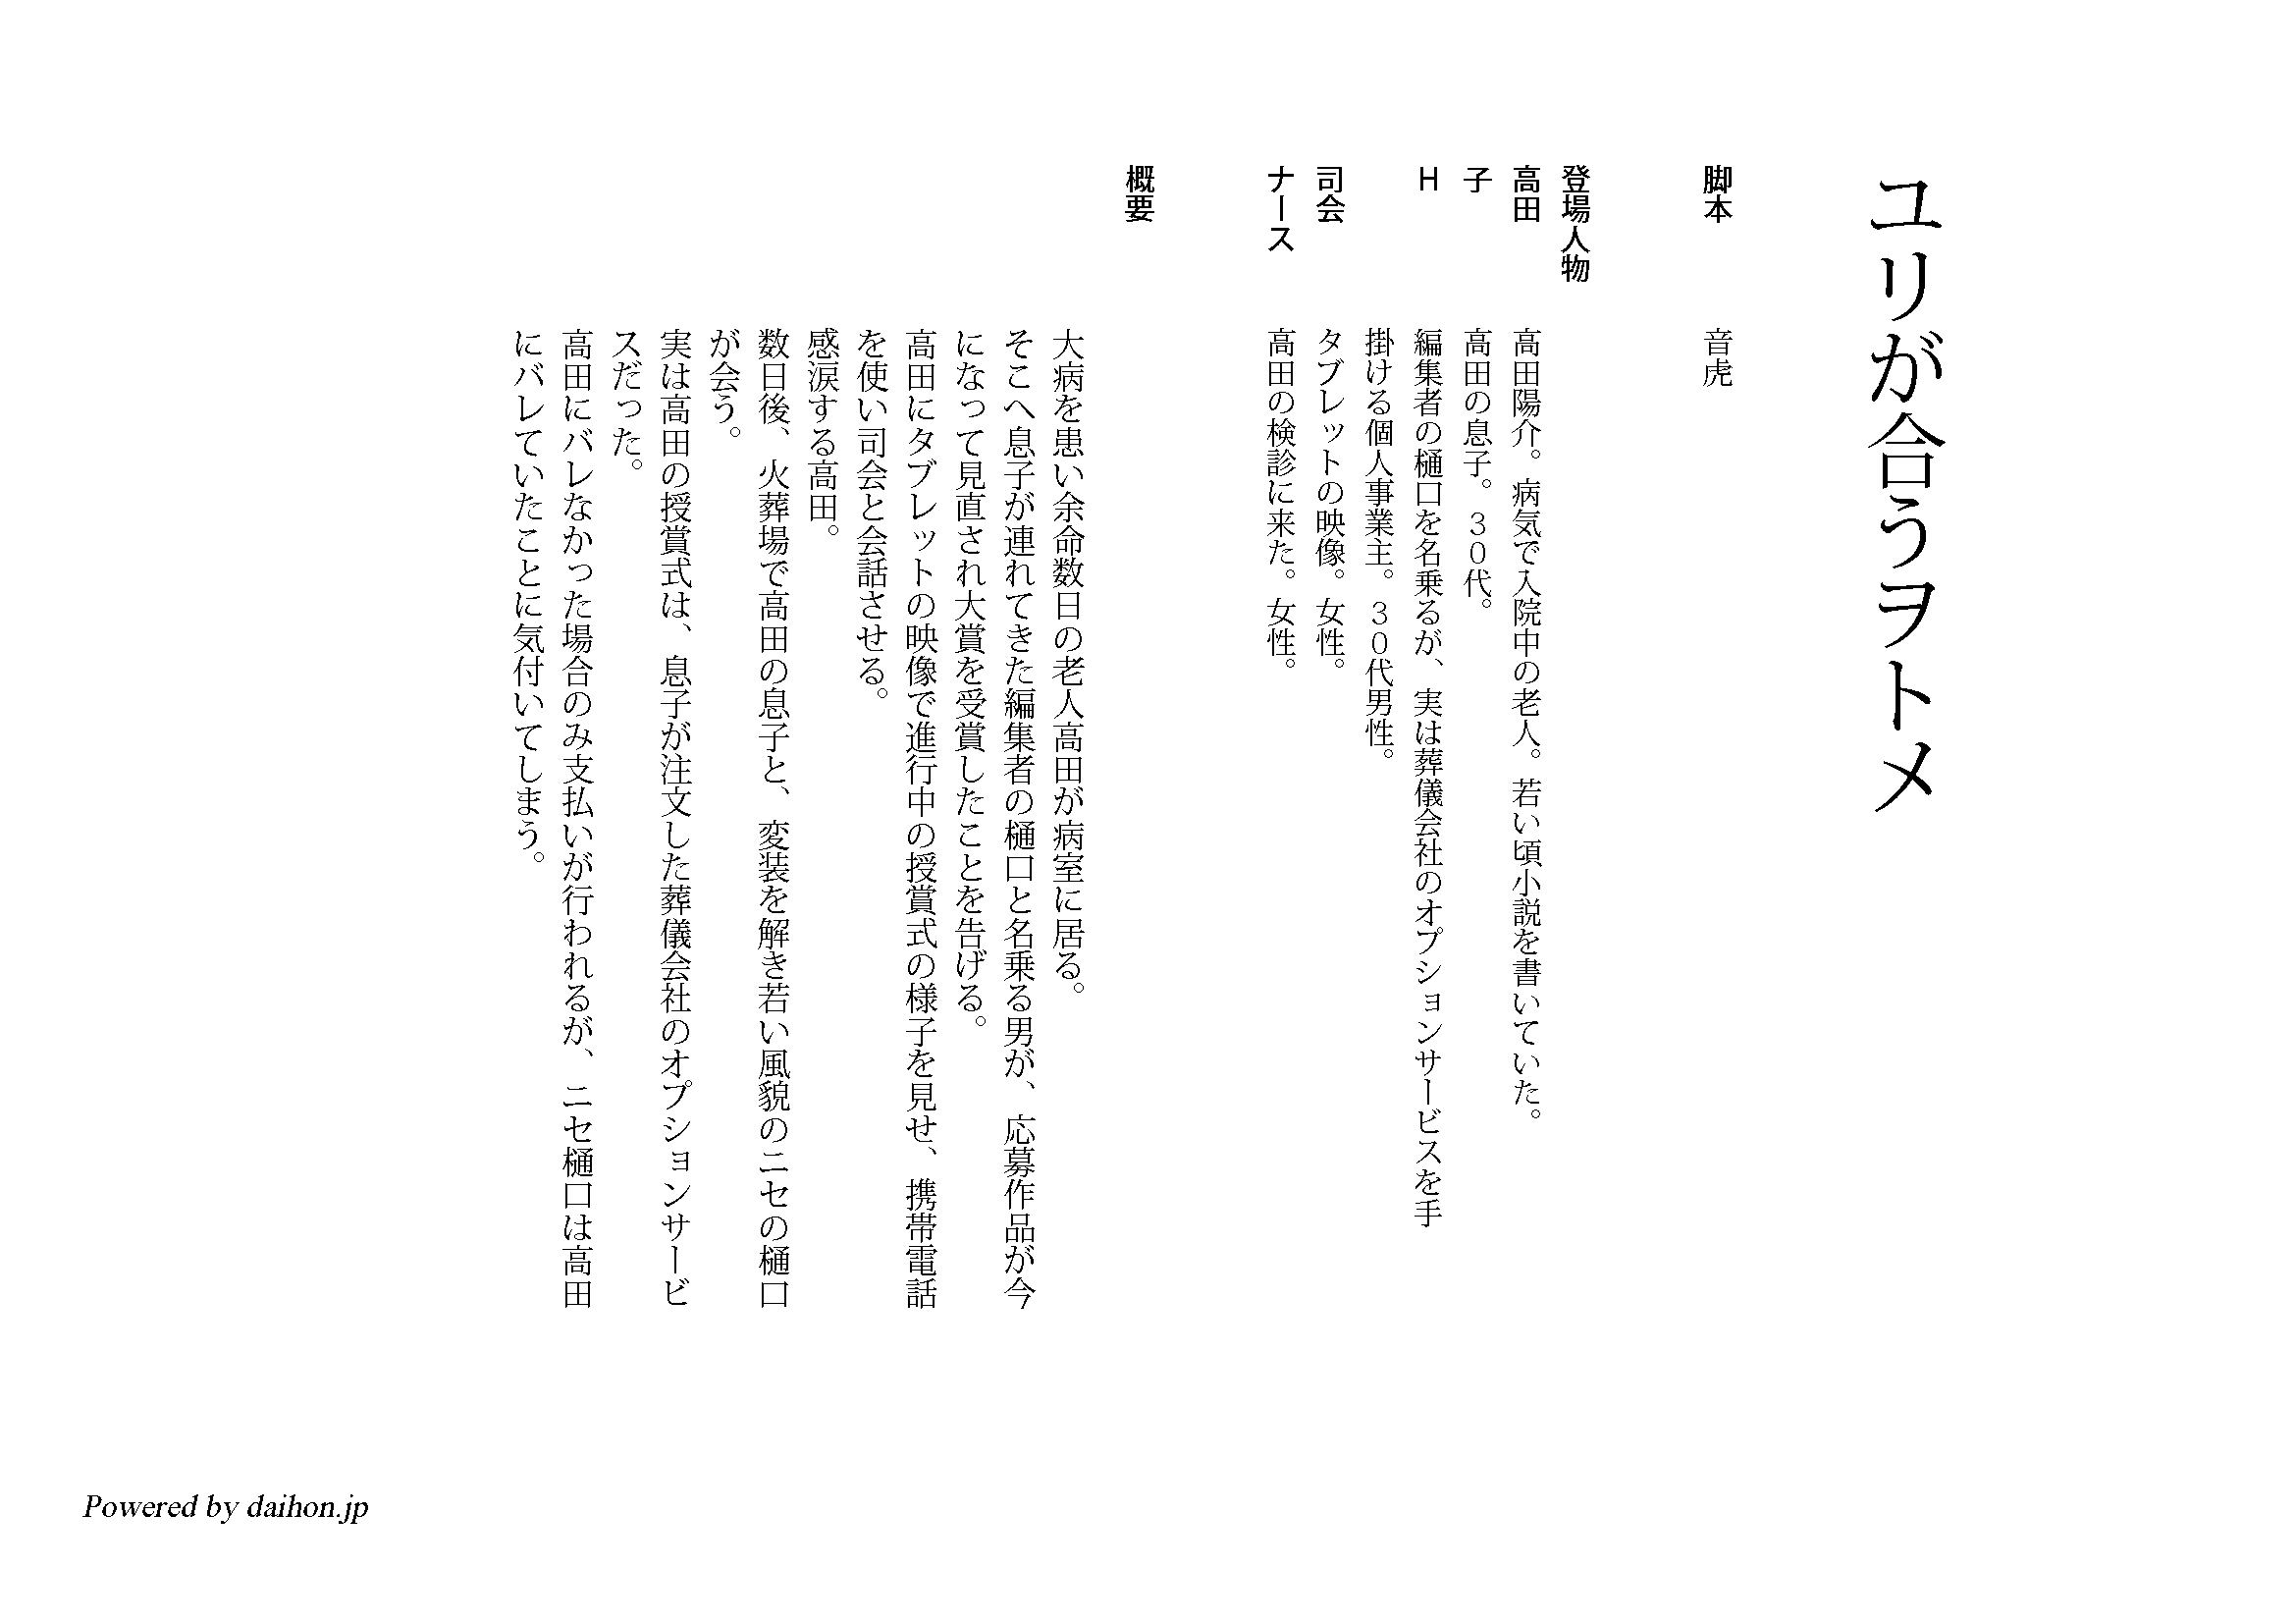 daihon.jp - 台本PDF変換